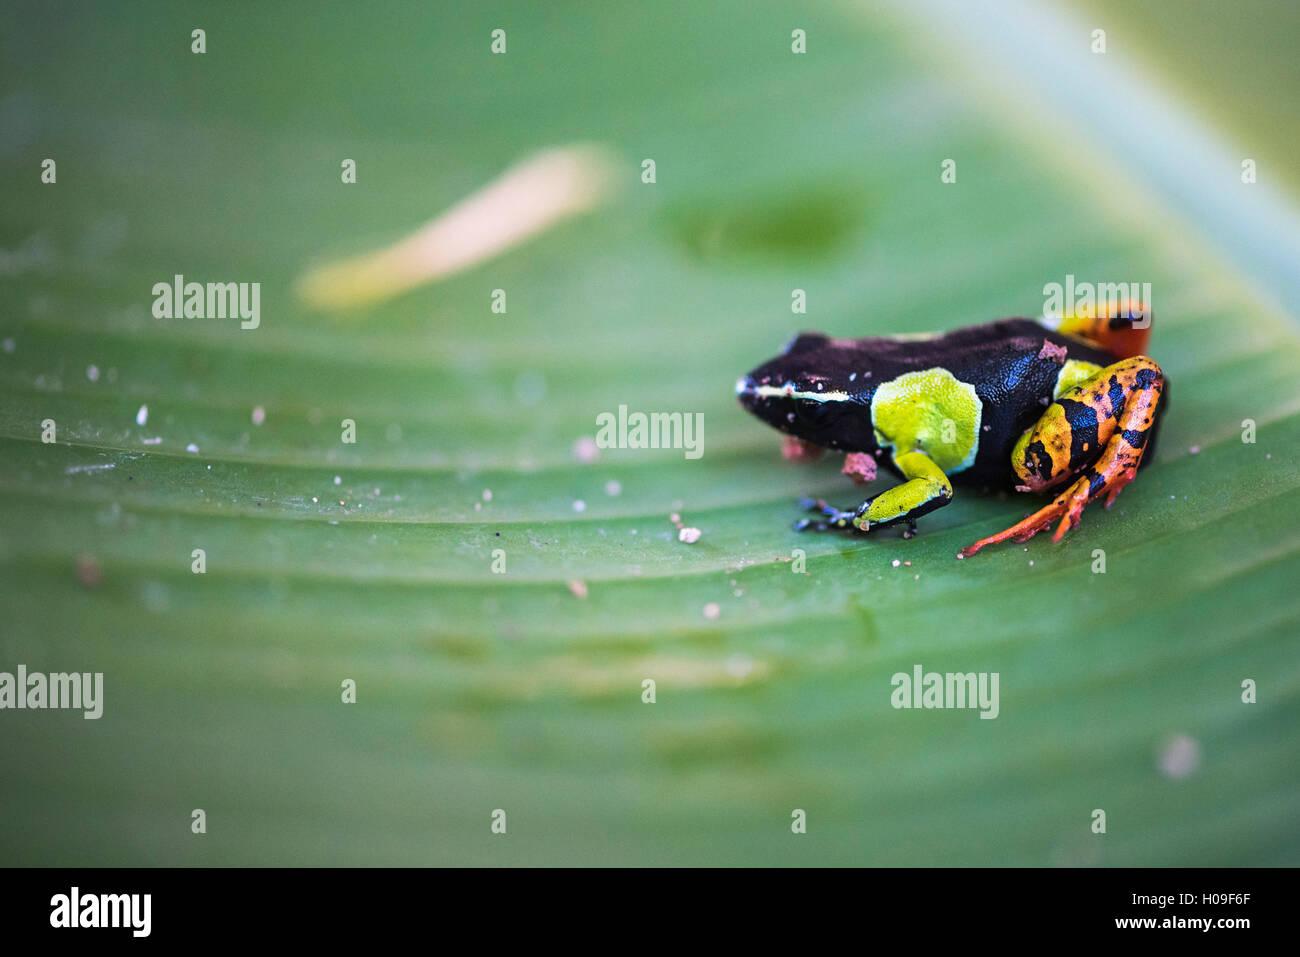 Mantella baroni, a frog endemic to Madagascar, Africa - Stock Image